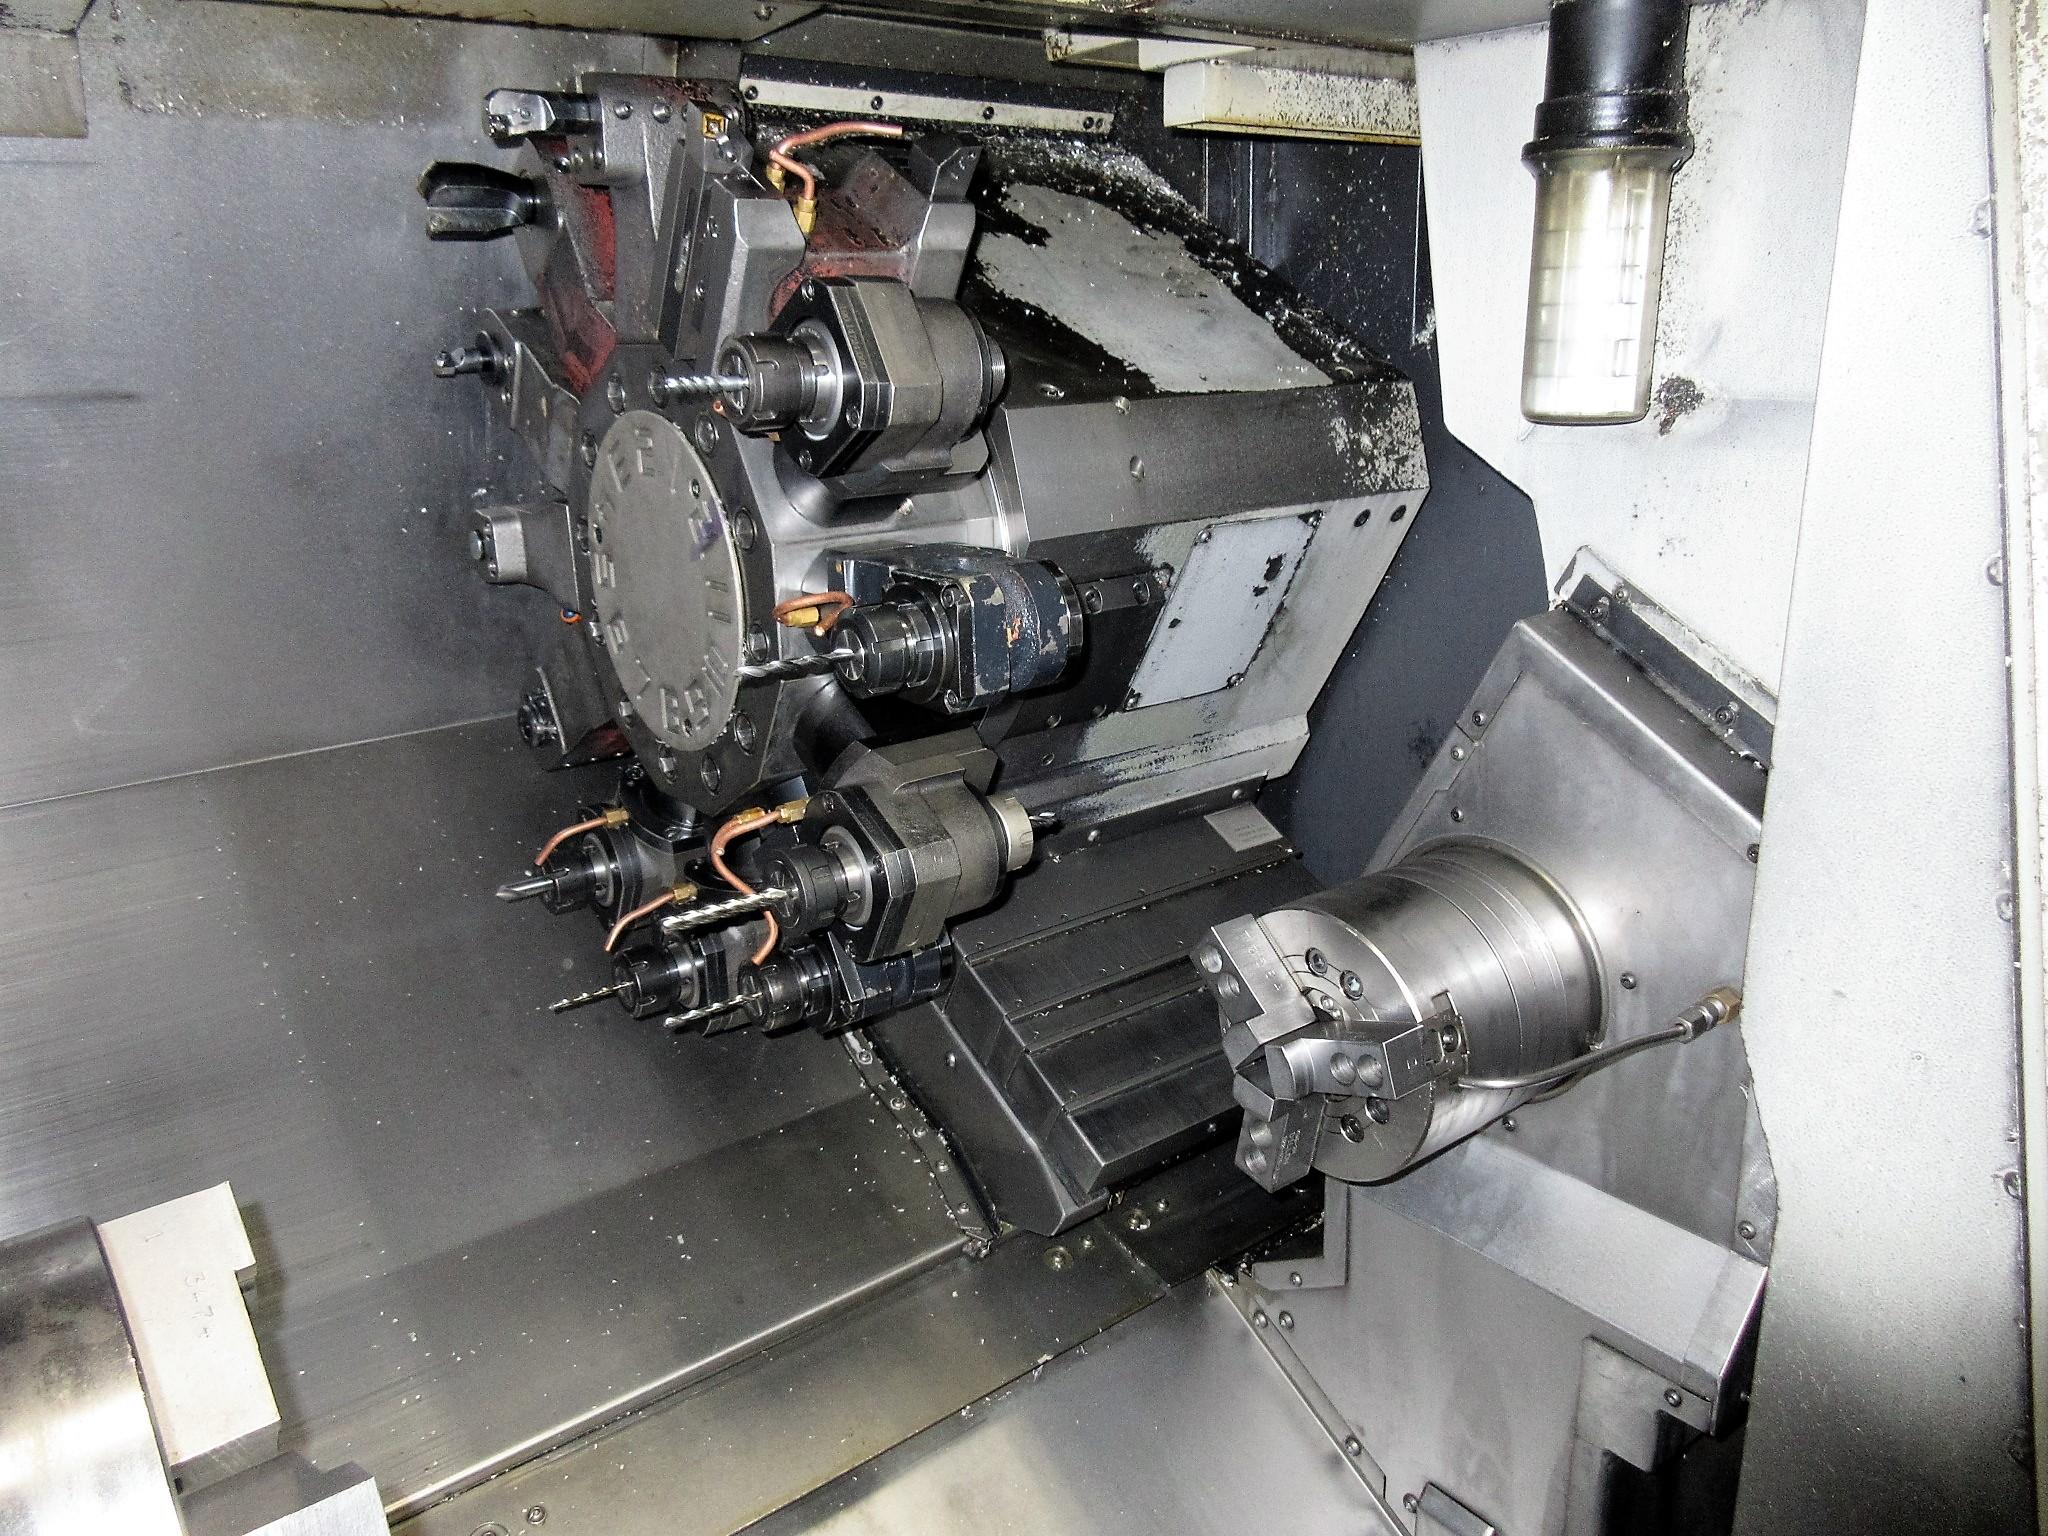 MAZAK QUICK TURN NEXUS 250-II MSY CNC TURNING CENTER - Image 6 of 16